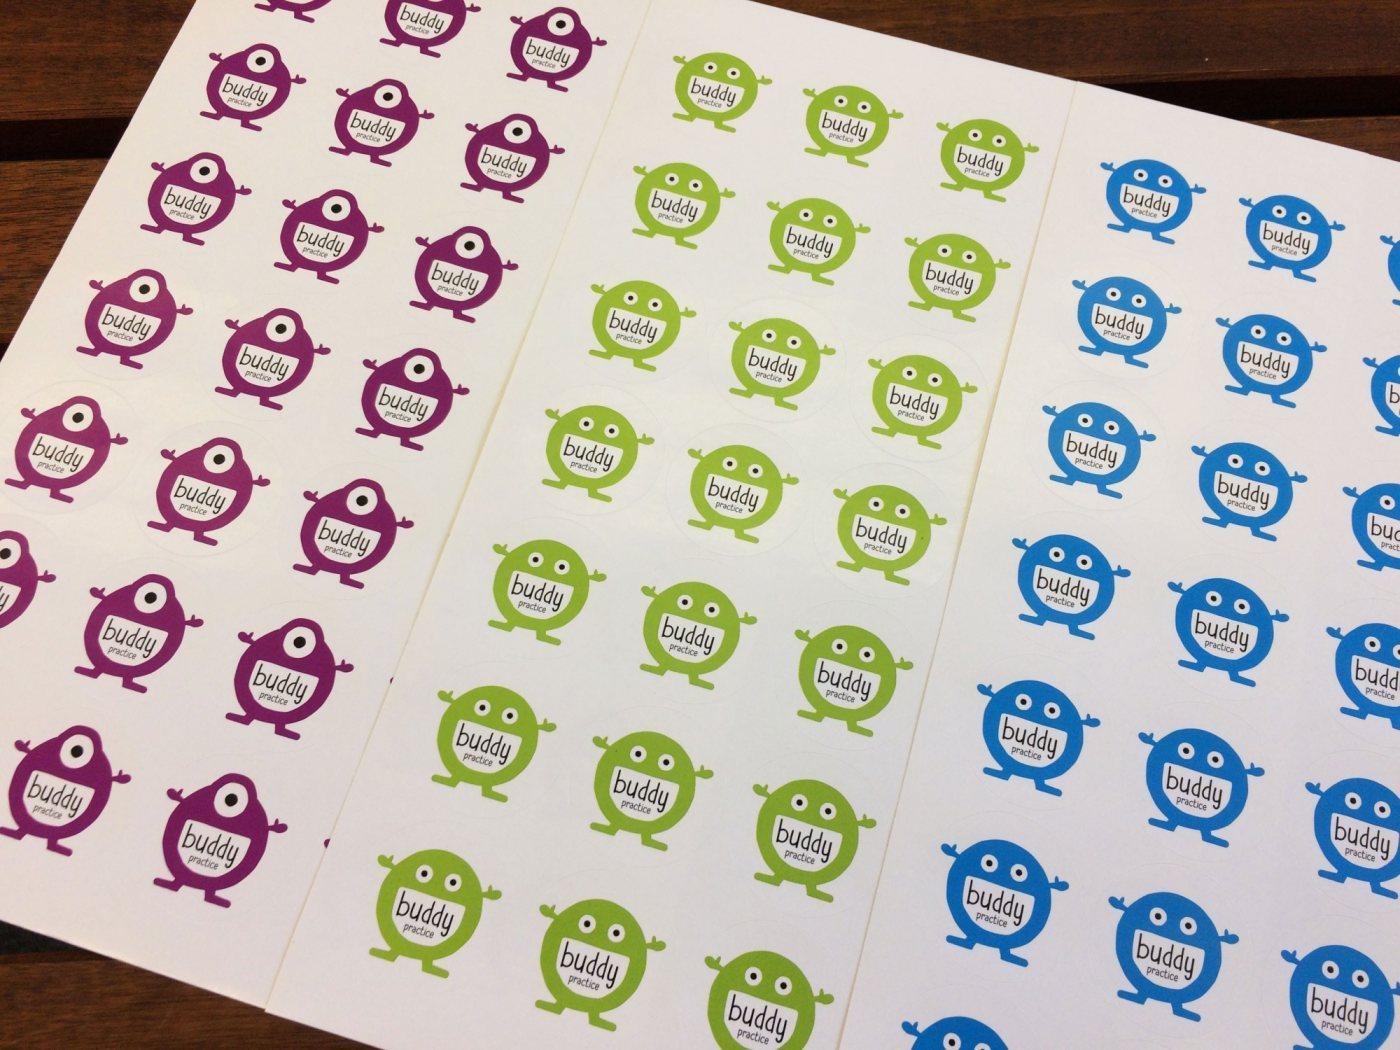 Buddypractice stickers